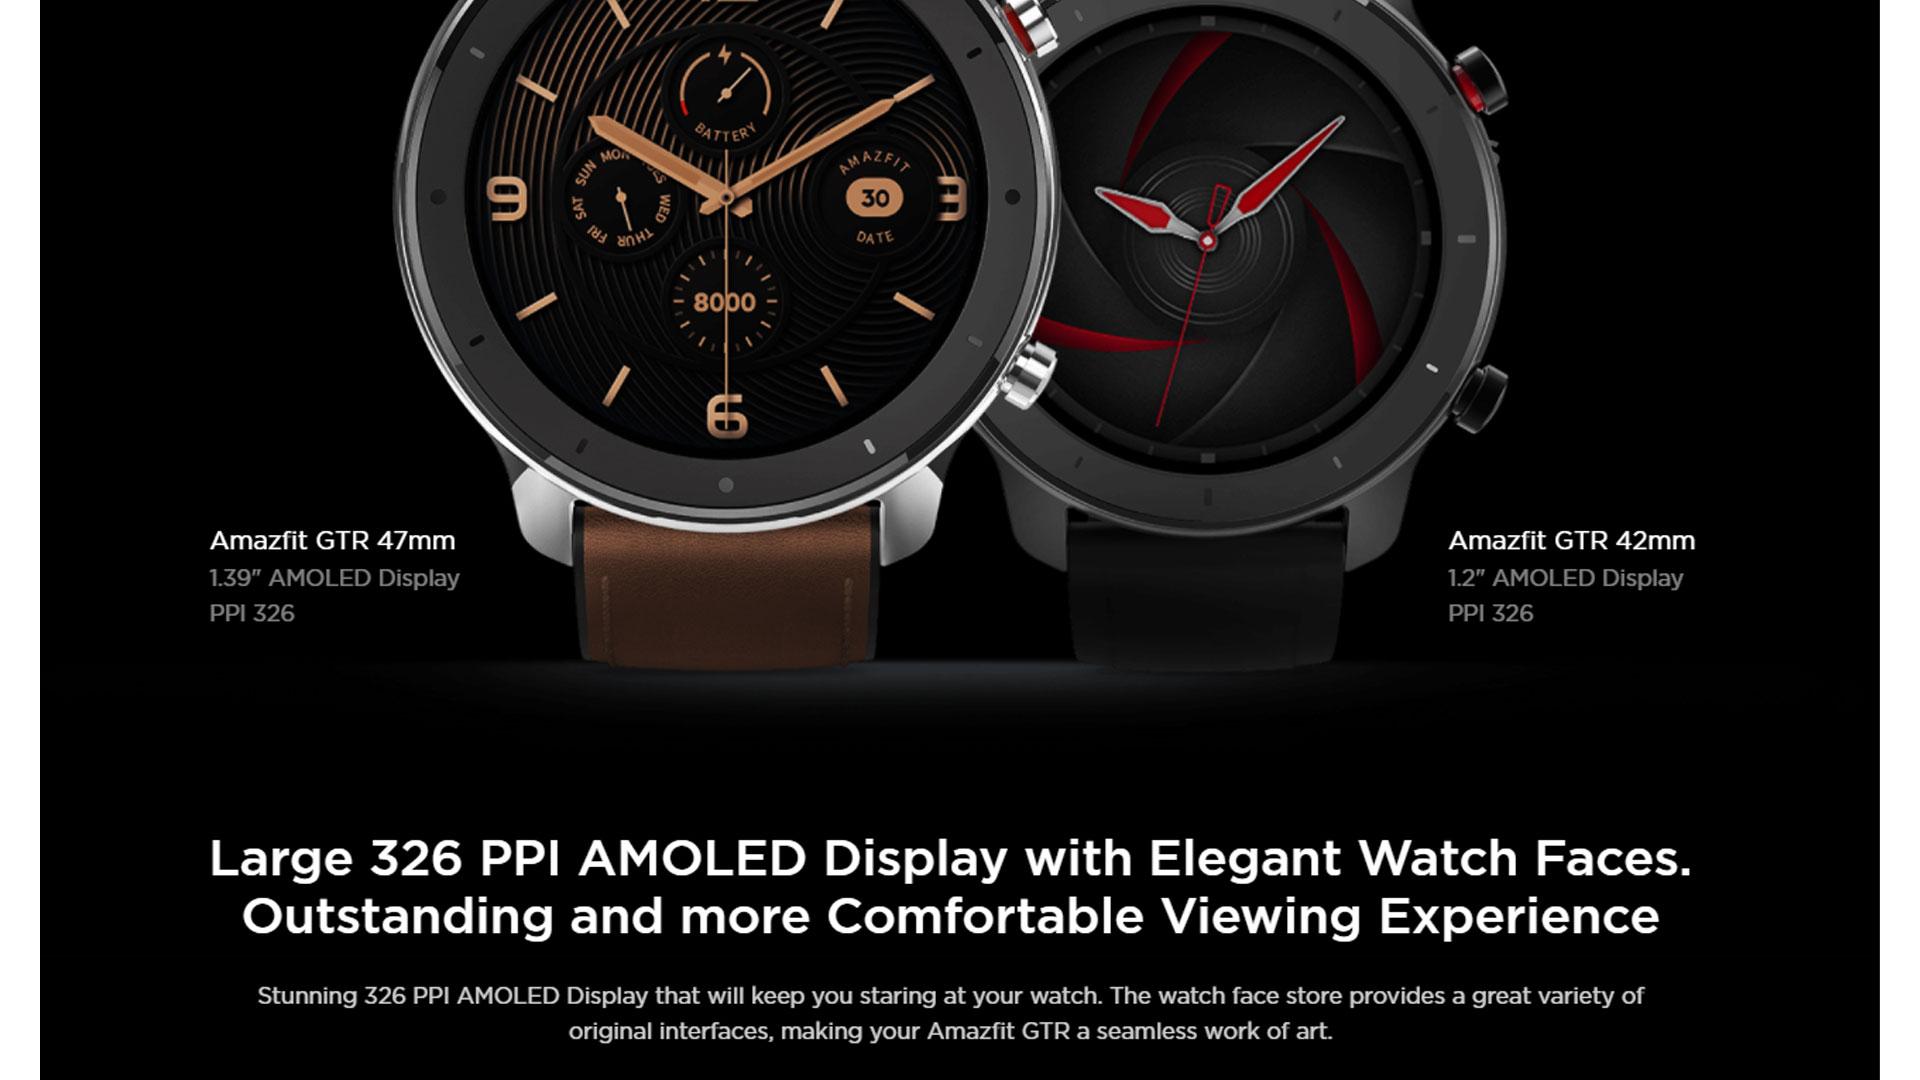 Amazfit GTR 47 Reloj Amazfit Reloj Amazfit